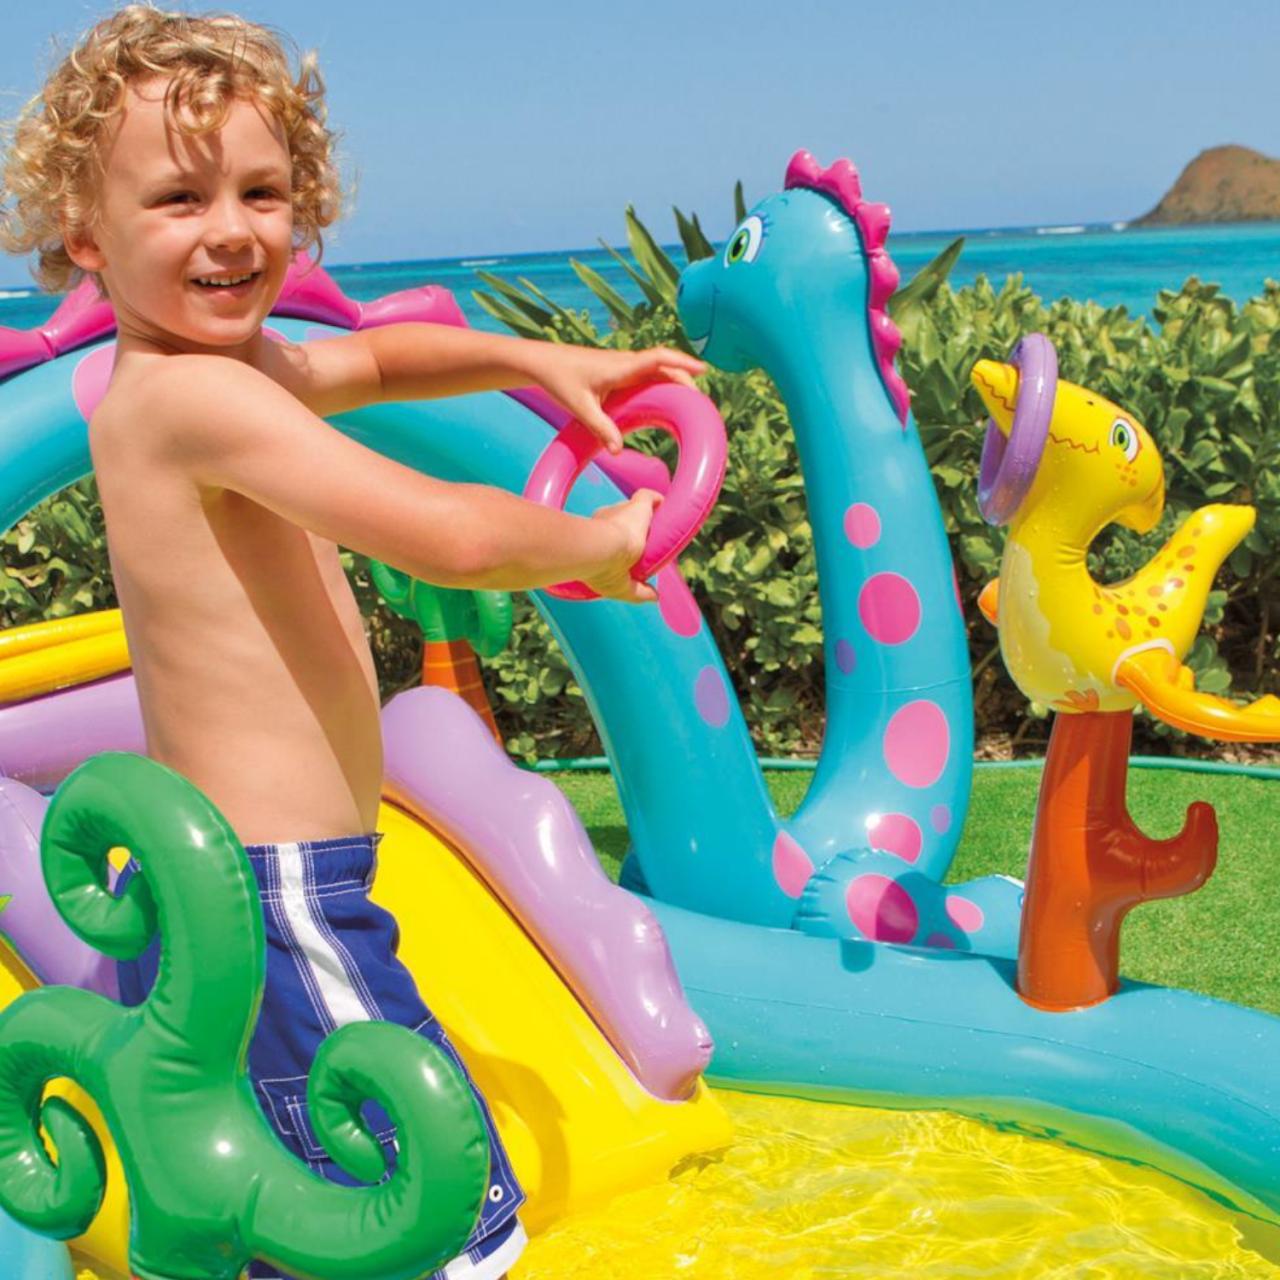 Intex 57135 Play Center Dinoland Planschbecken Pool Wasserrutsche +Bälle